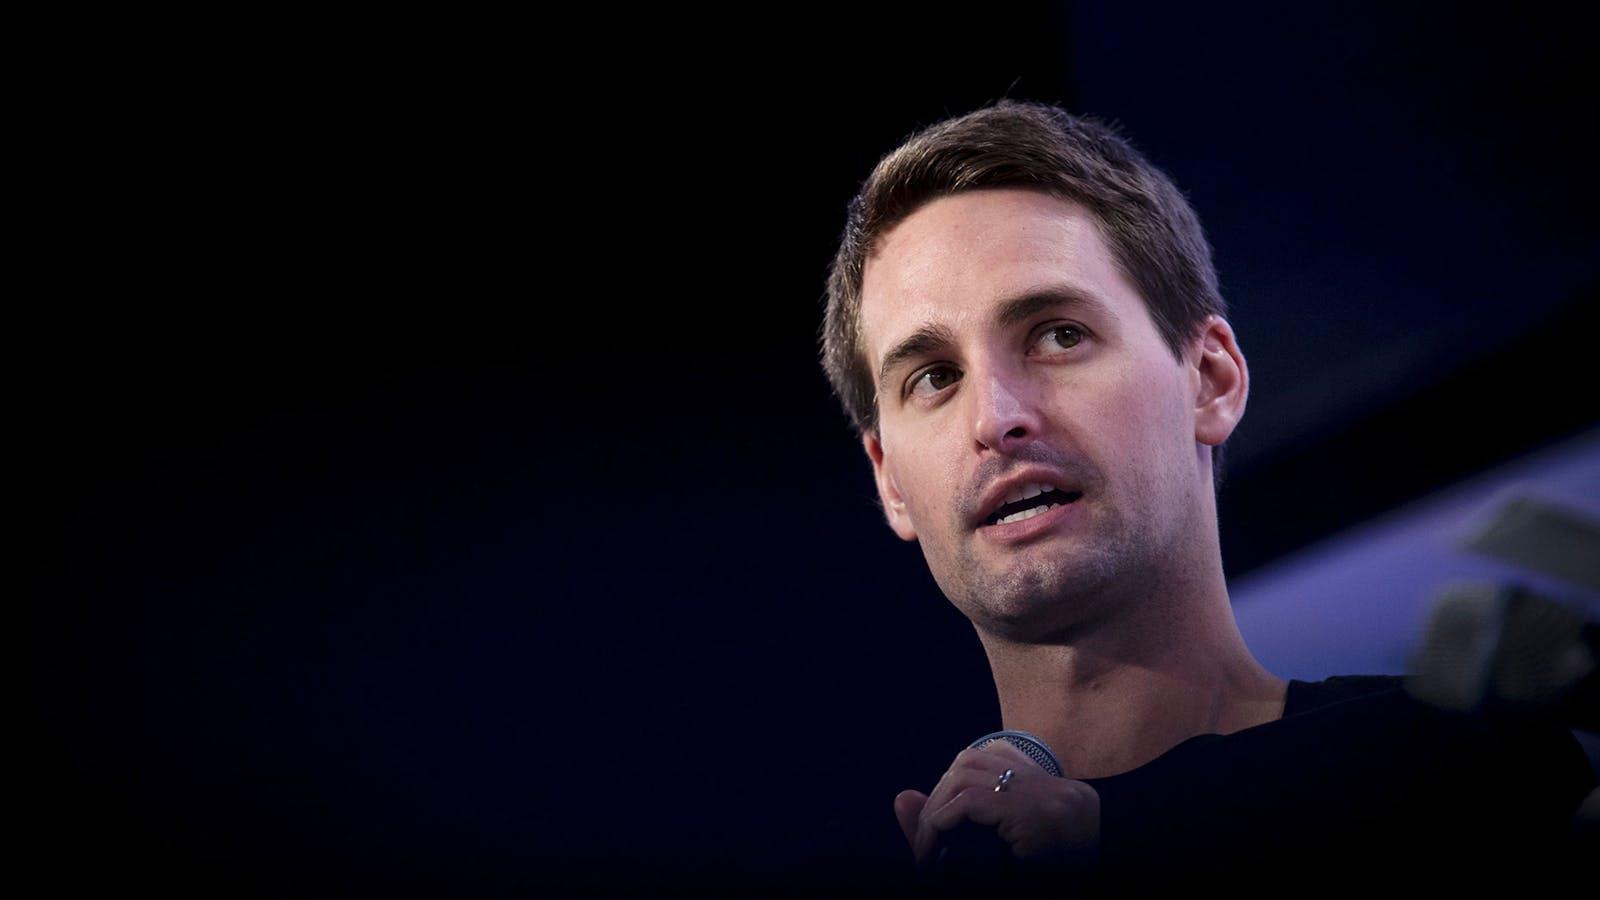 Evan Spiegel, CEO of Snap Inc., speaks in San Francisco in October. Photo by Bloomberg